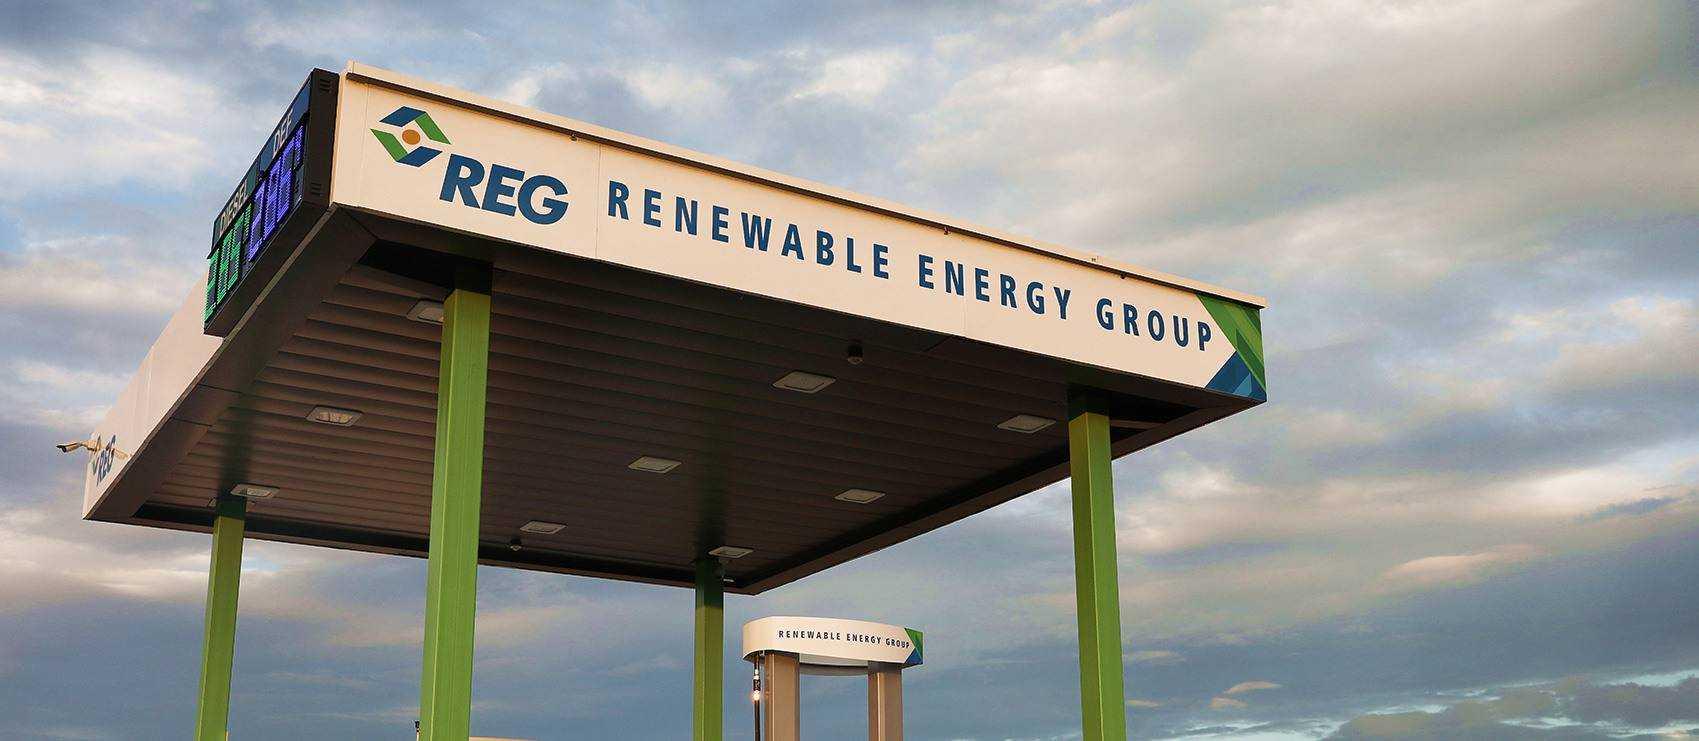 REG Renewable Energy Group station